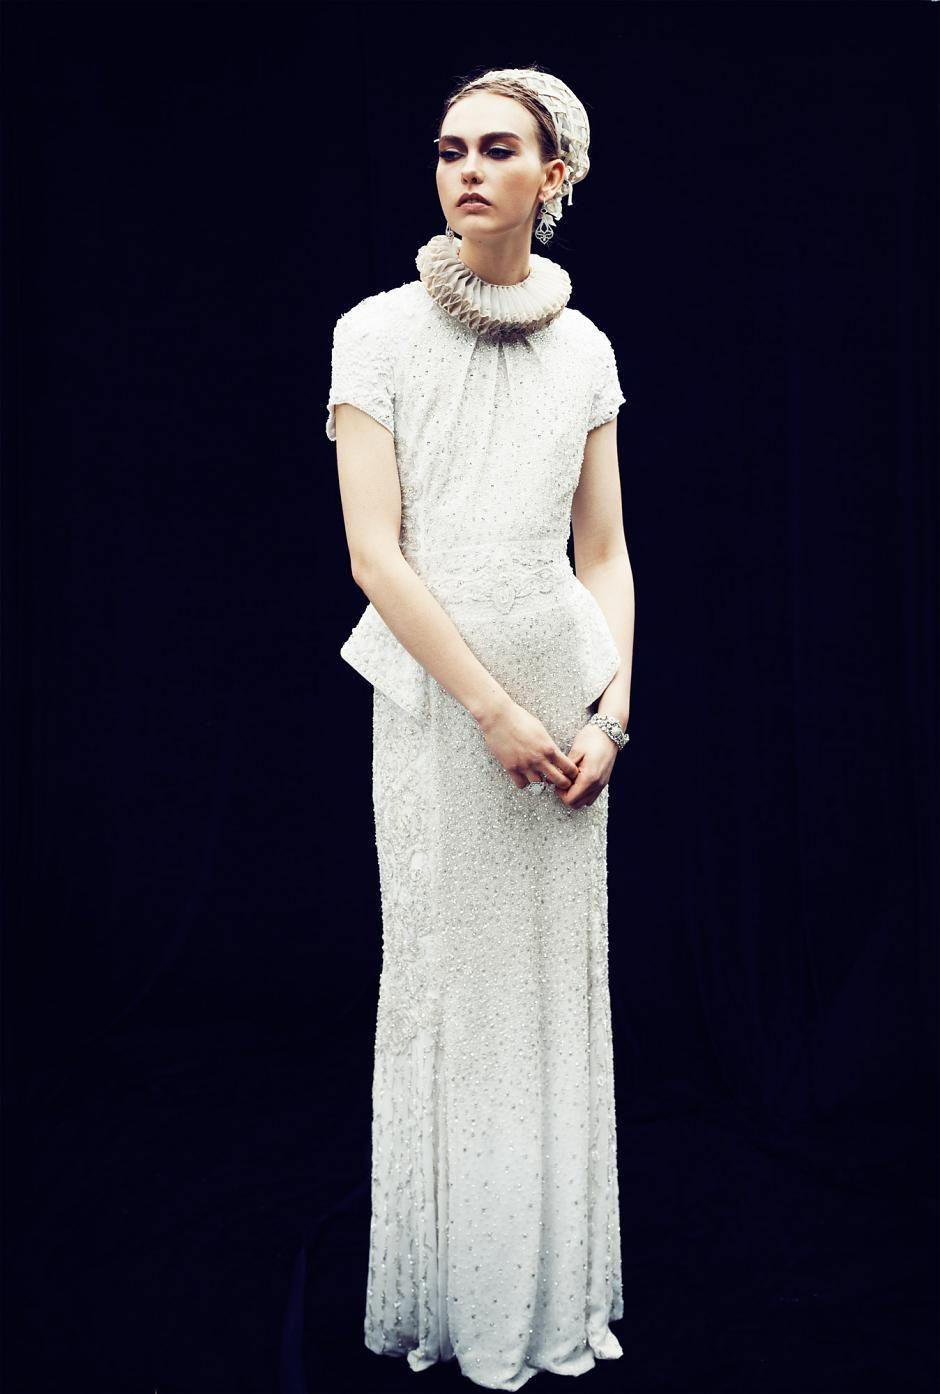 Tudor ruffs, tulle & medieval splendour: dressing like a modern-day style sovereign - Fashionising.com